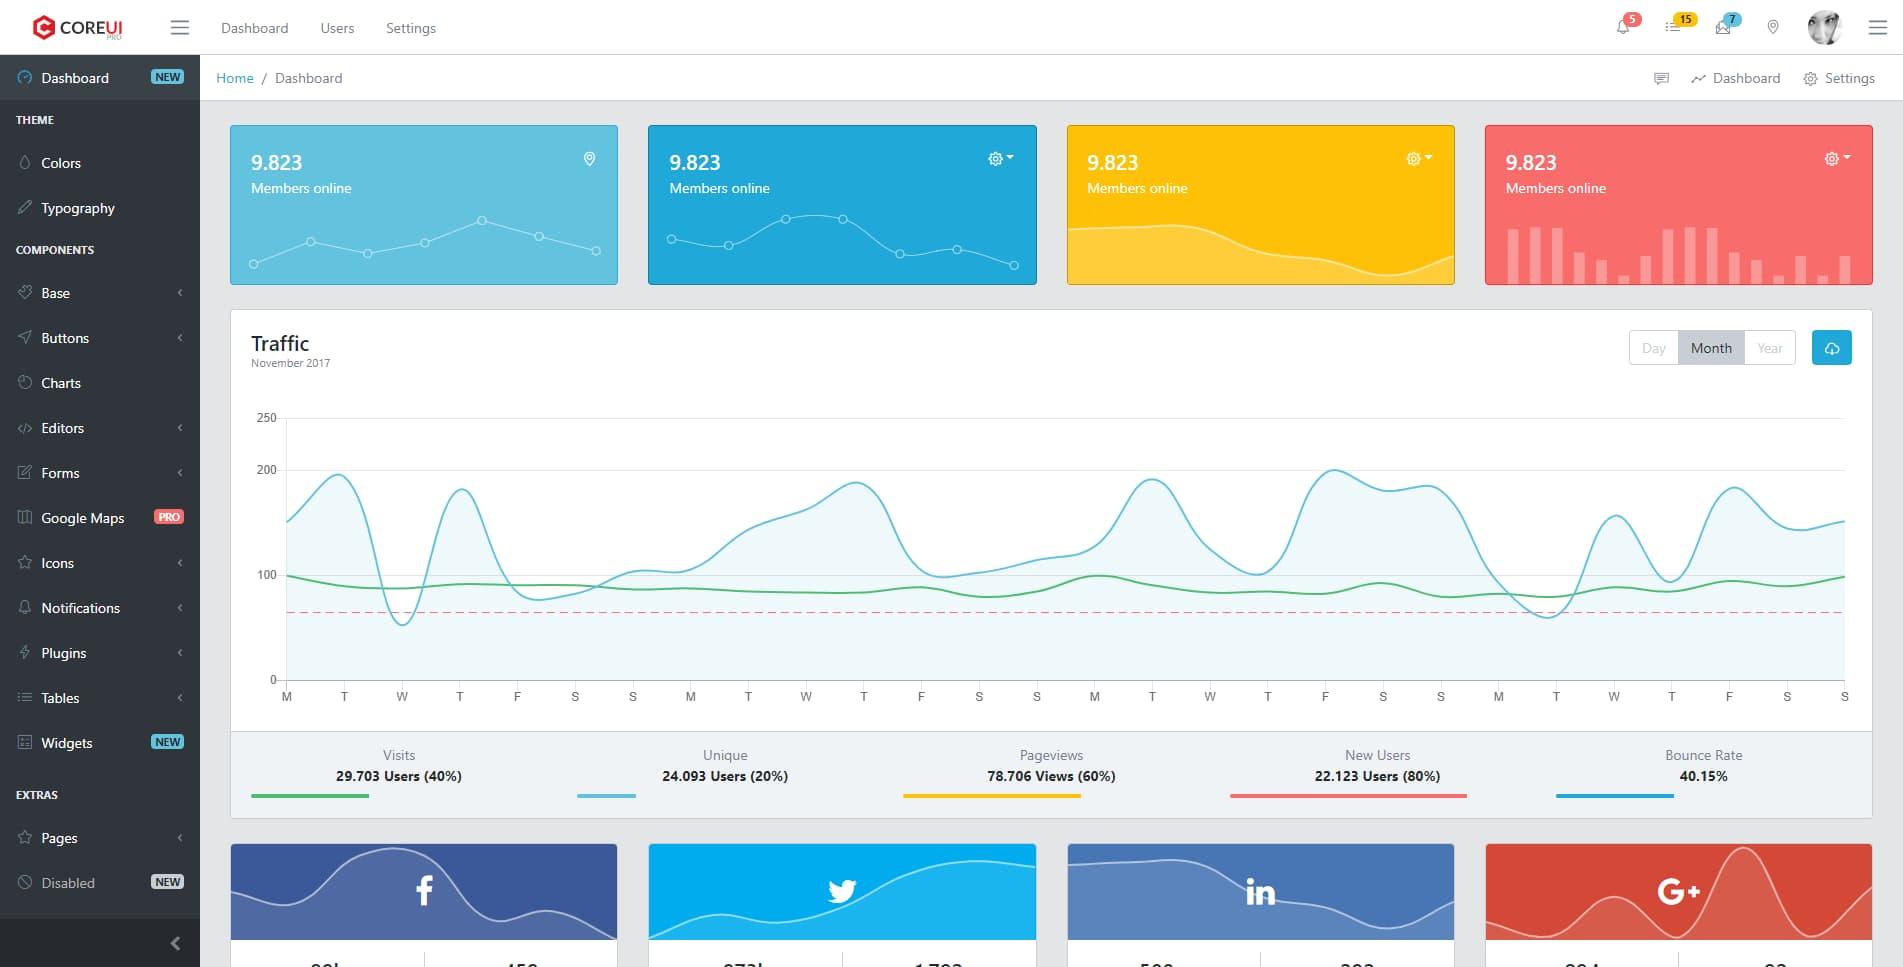 Preview of CoreUI dashboard